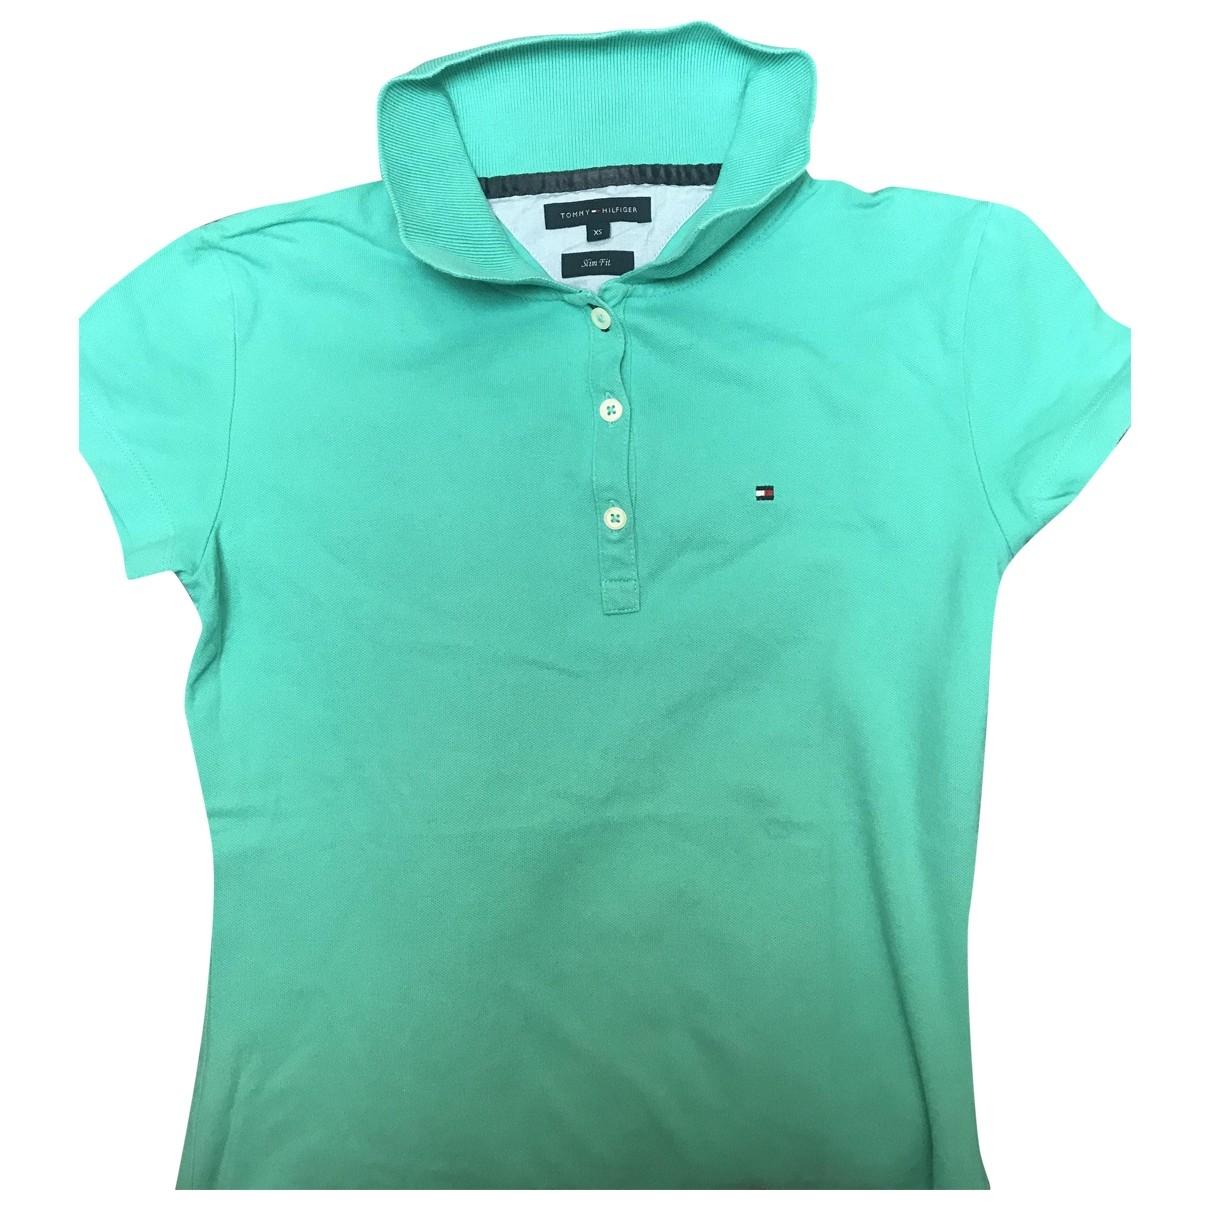 Tommy Hilfiger \N Turquoise Cotton Knitwear for Women 36 IT